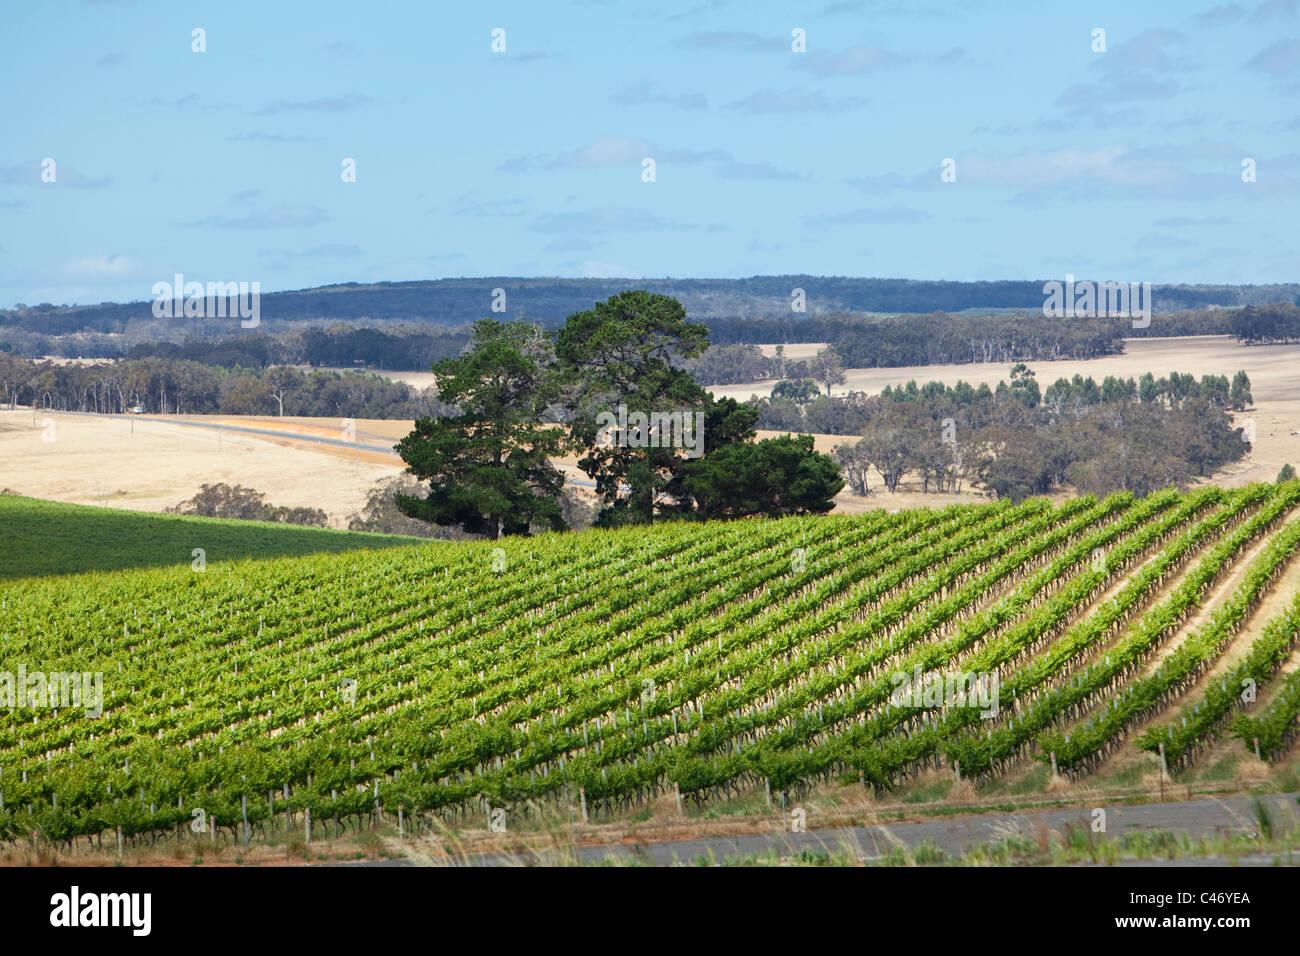 Vineyard in the Mt Barker wine region. Mt Barker, Western Australia, Australia Stock Photo